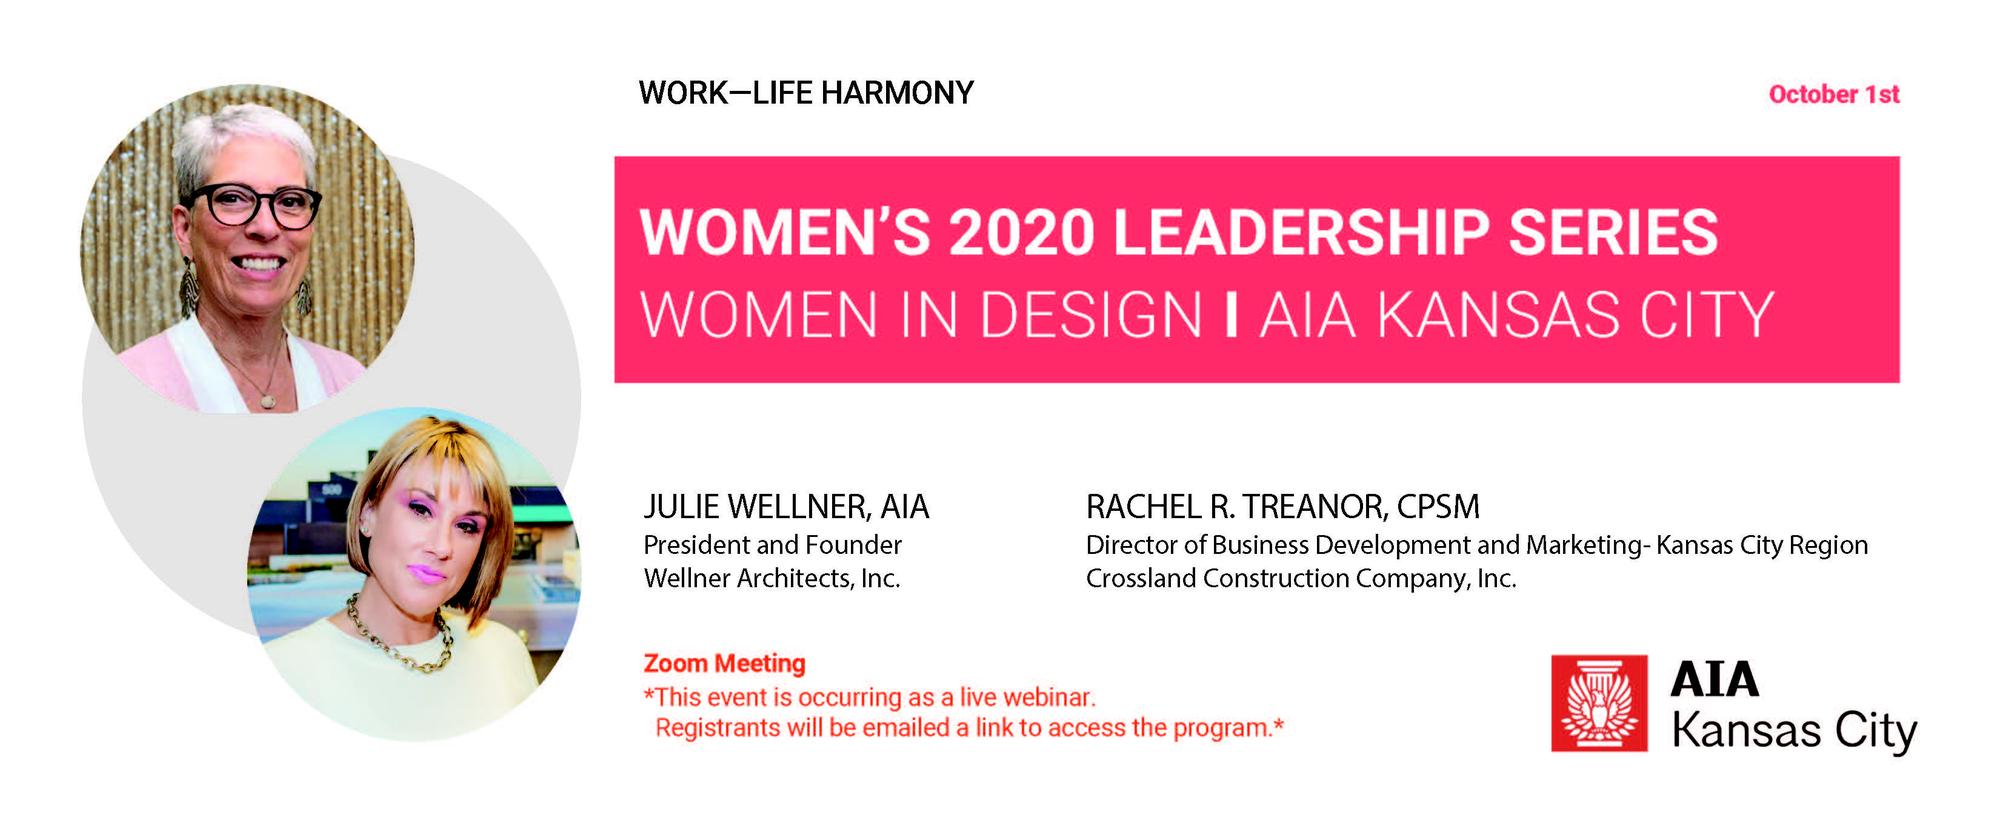 Women's Leadership Series: Julie Wellner, AIA and Rachel Treanor, CPSM